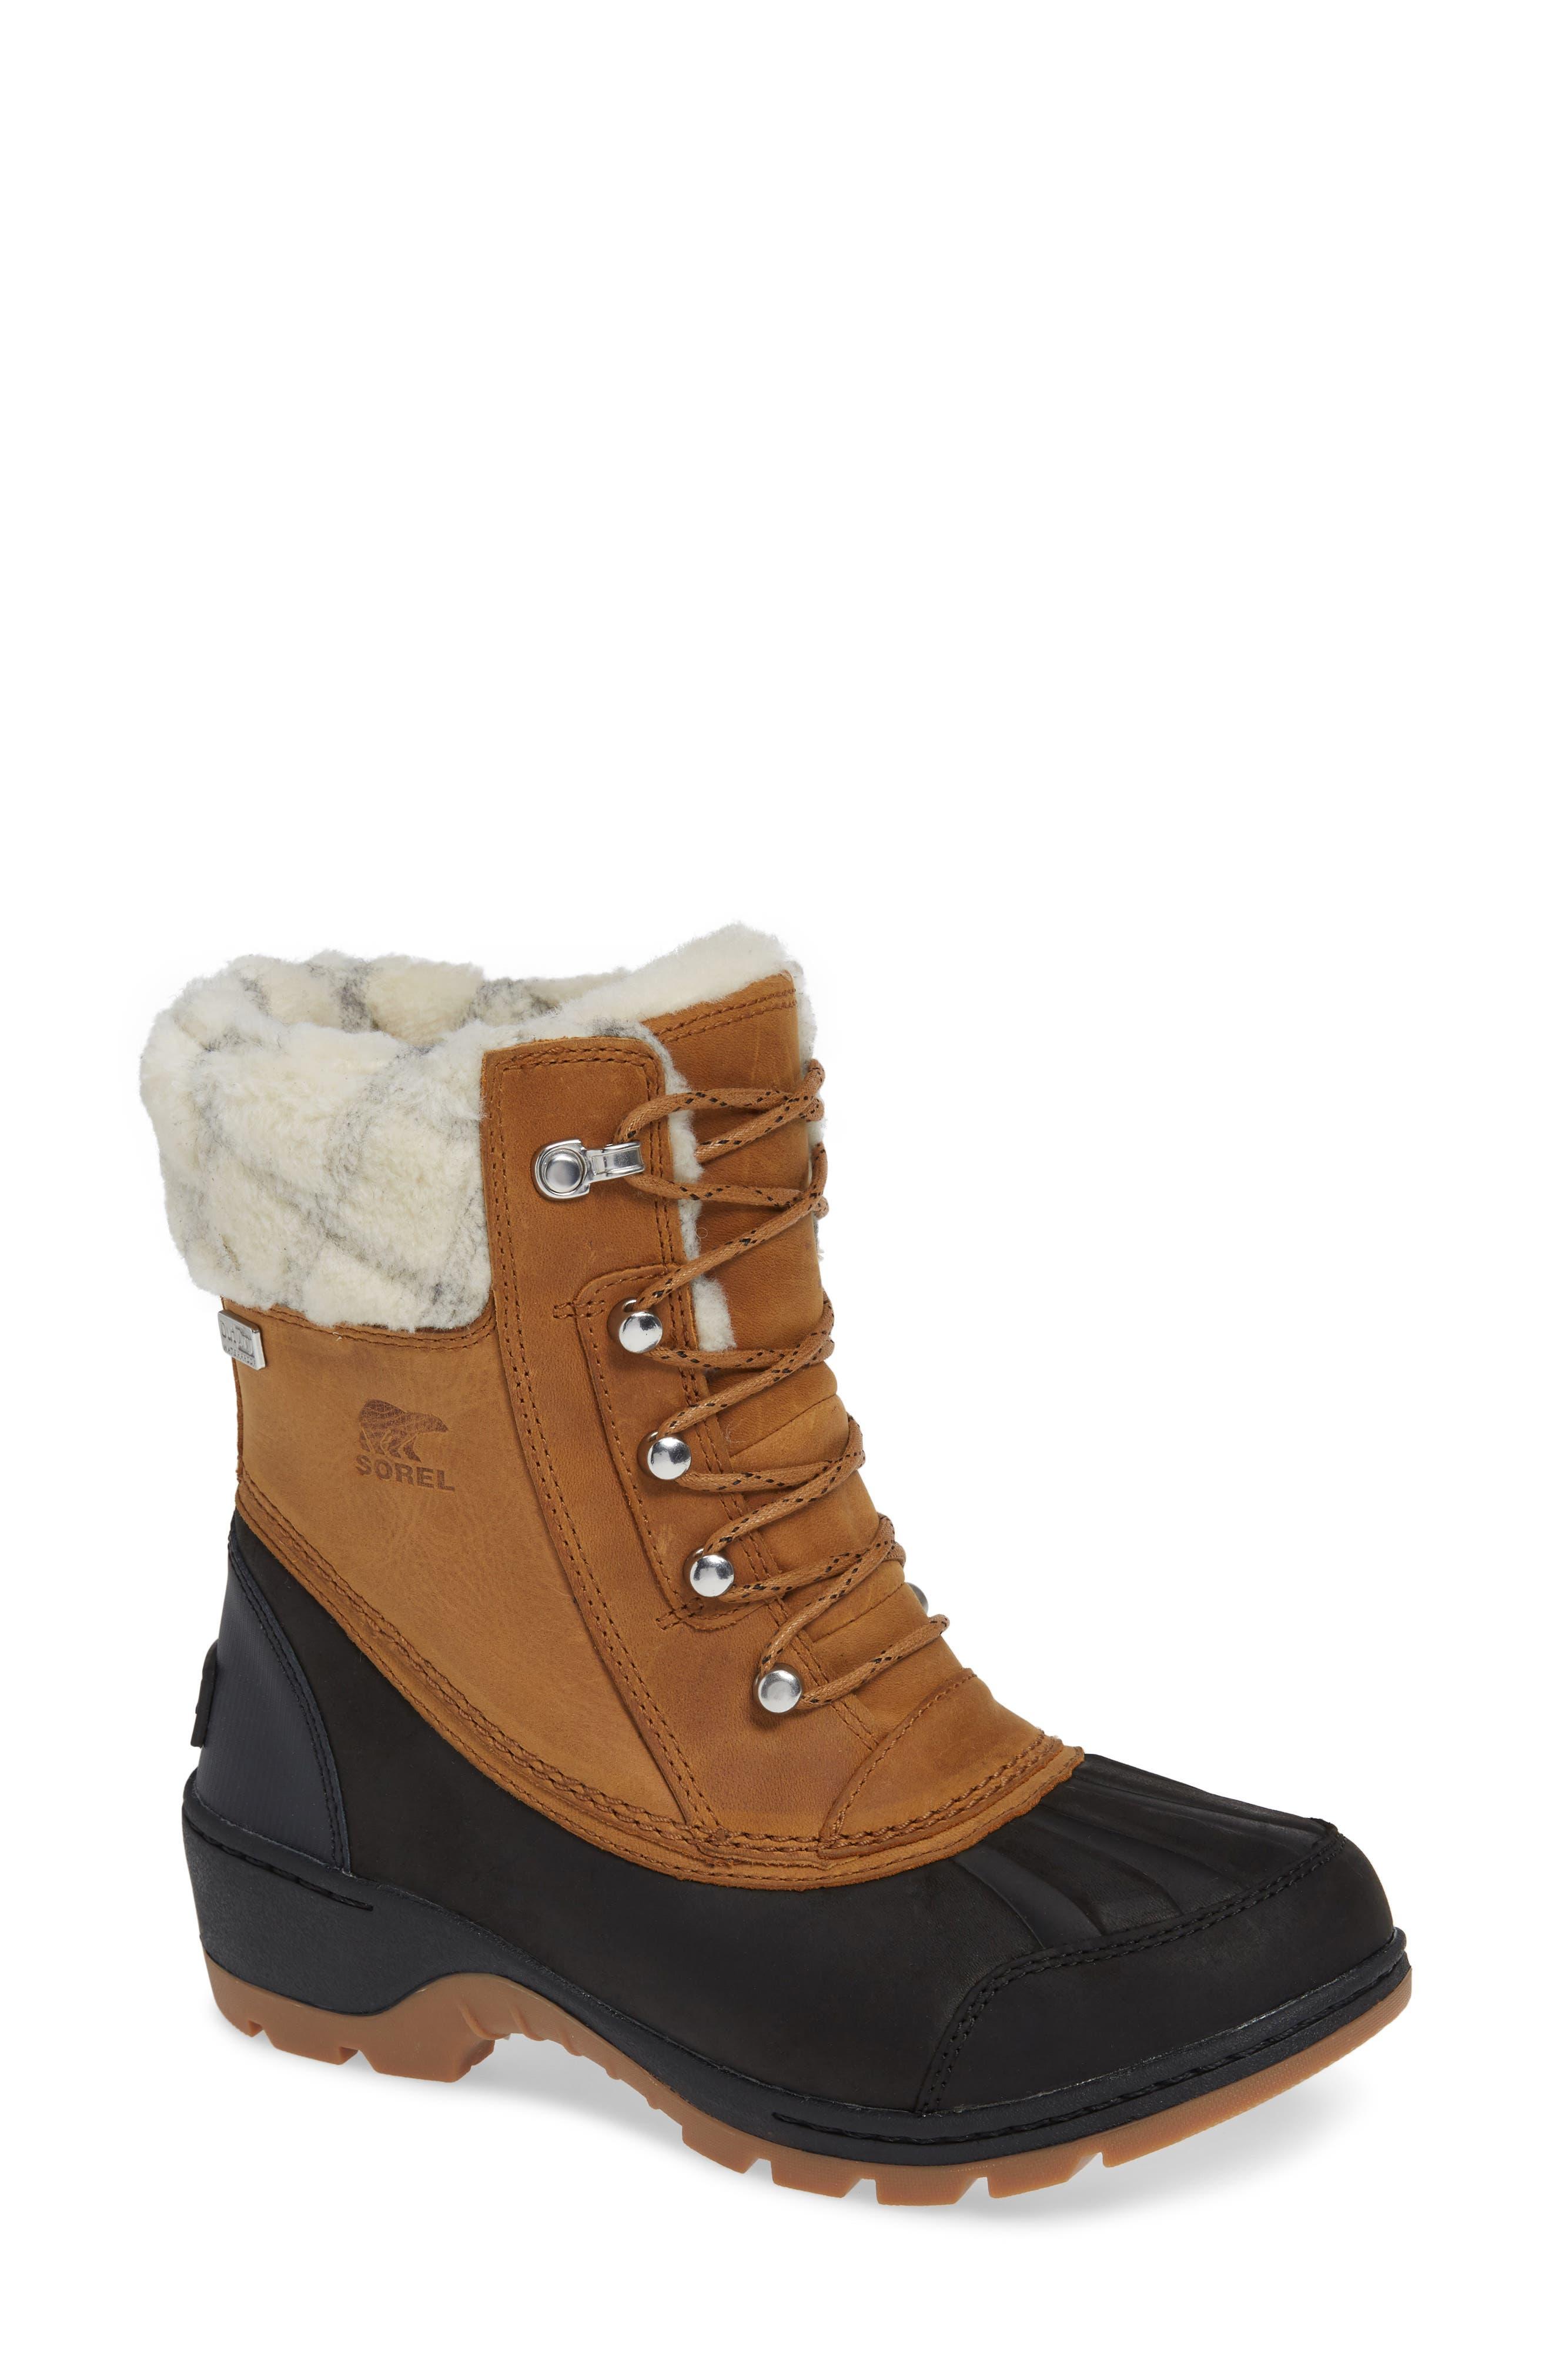 Sorel Whistler(TM) Waterproof Insulated Boot, Brown